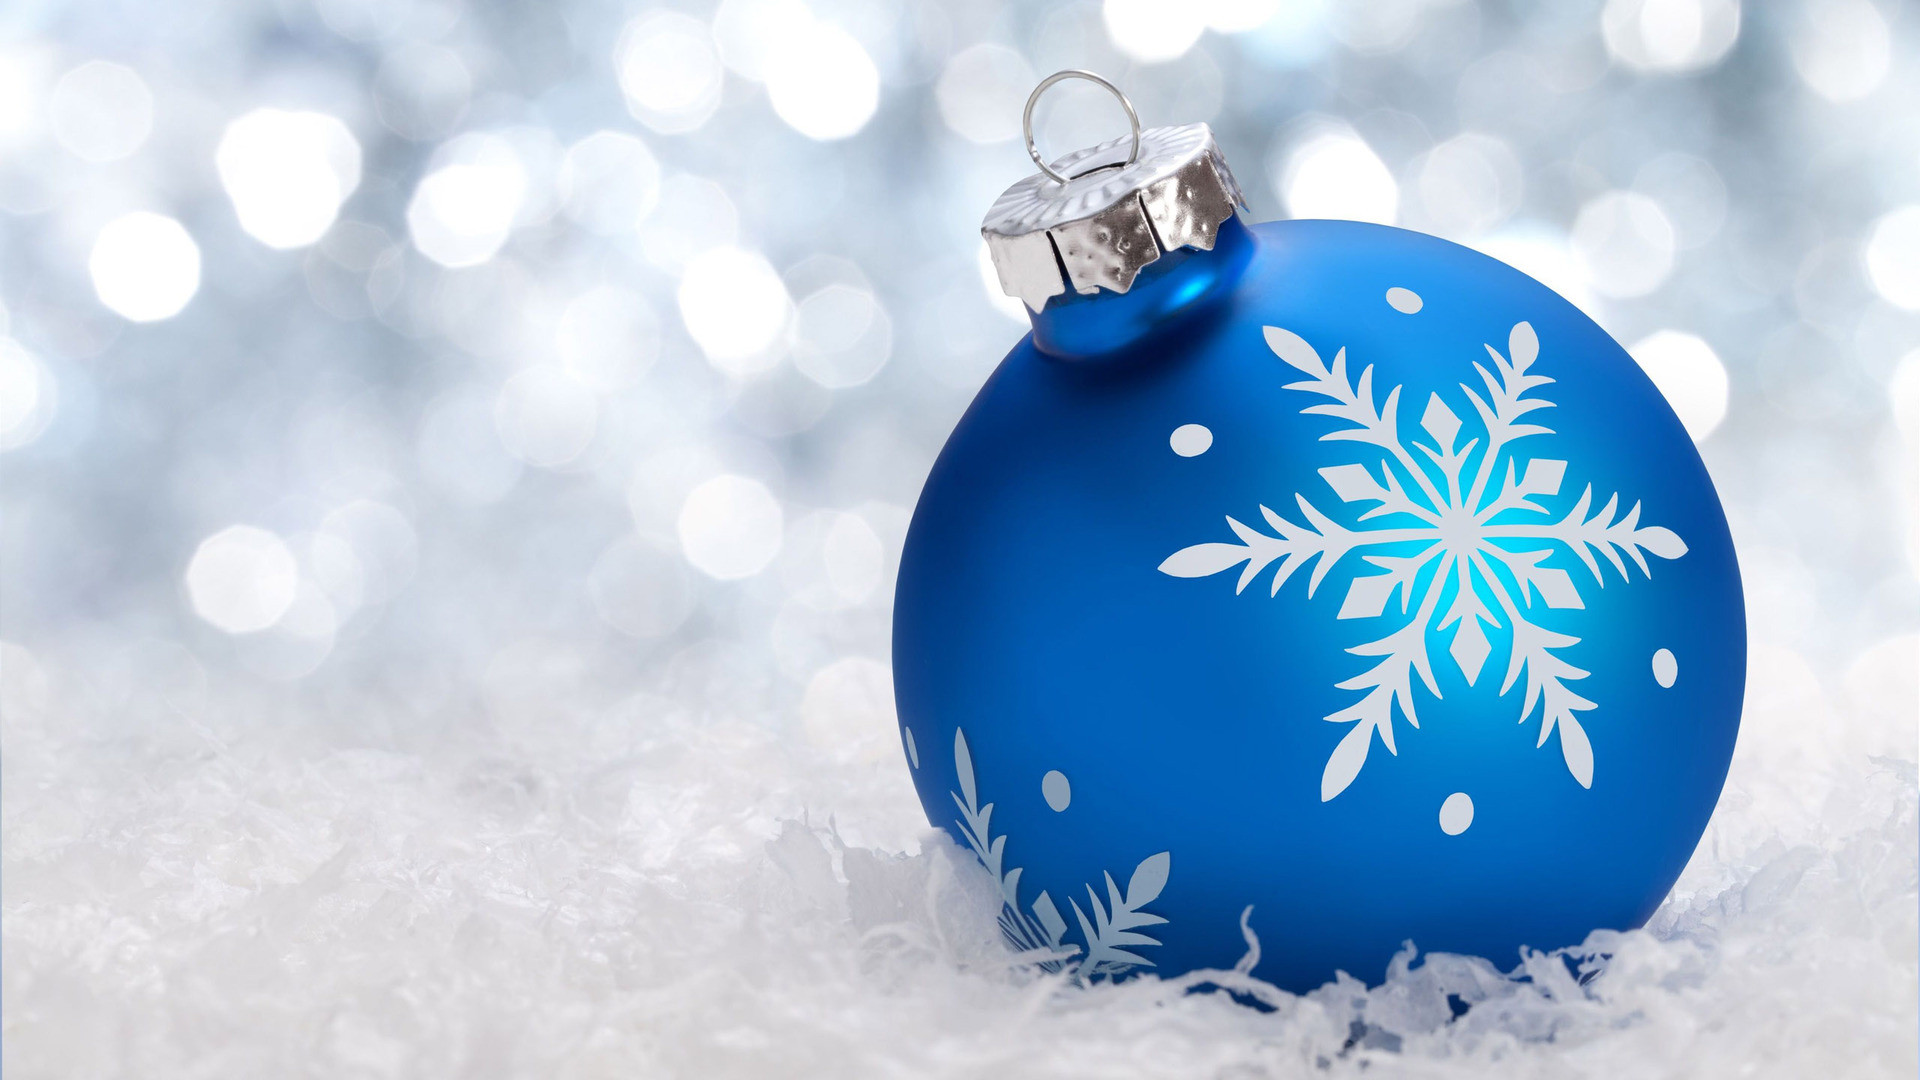 Blue Christmas Ornament Hd Wallpaper Blue Data Src Happy New Year 2018 Sister 1920x1080 Wallpaper Teahub Io